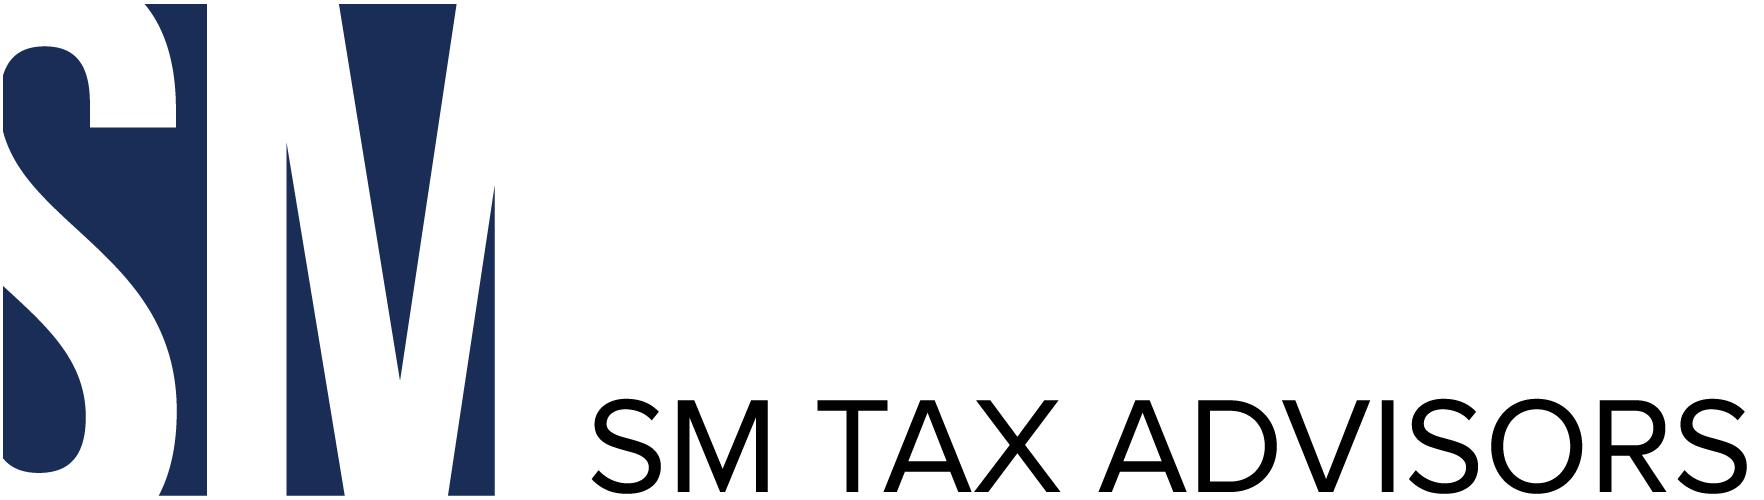 SM Tax Advisors